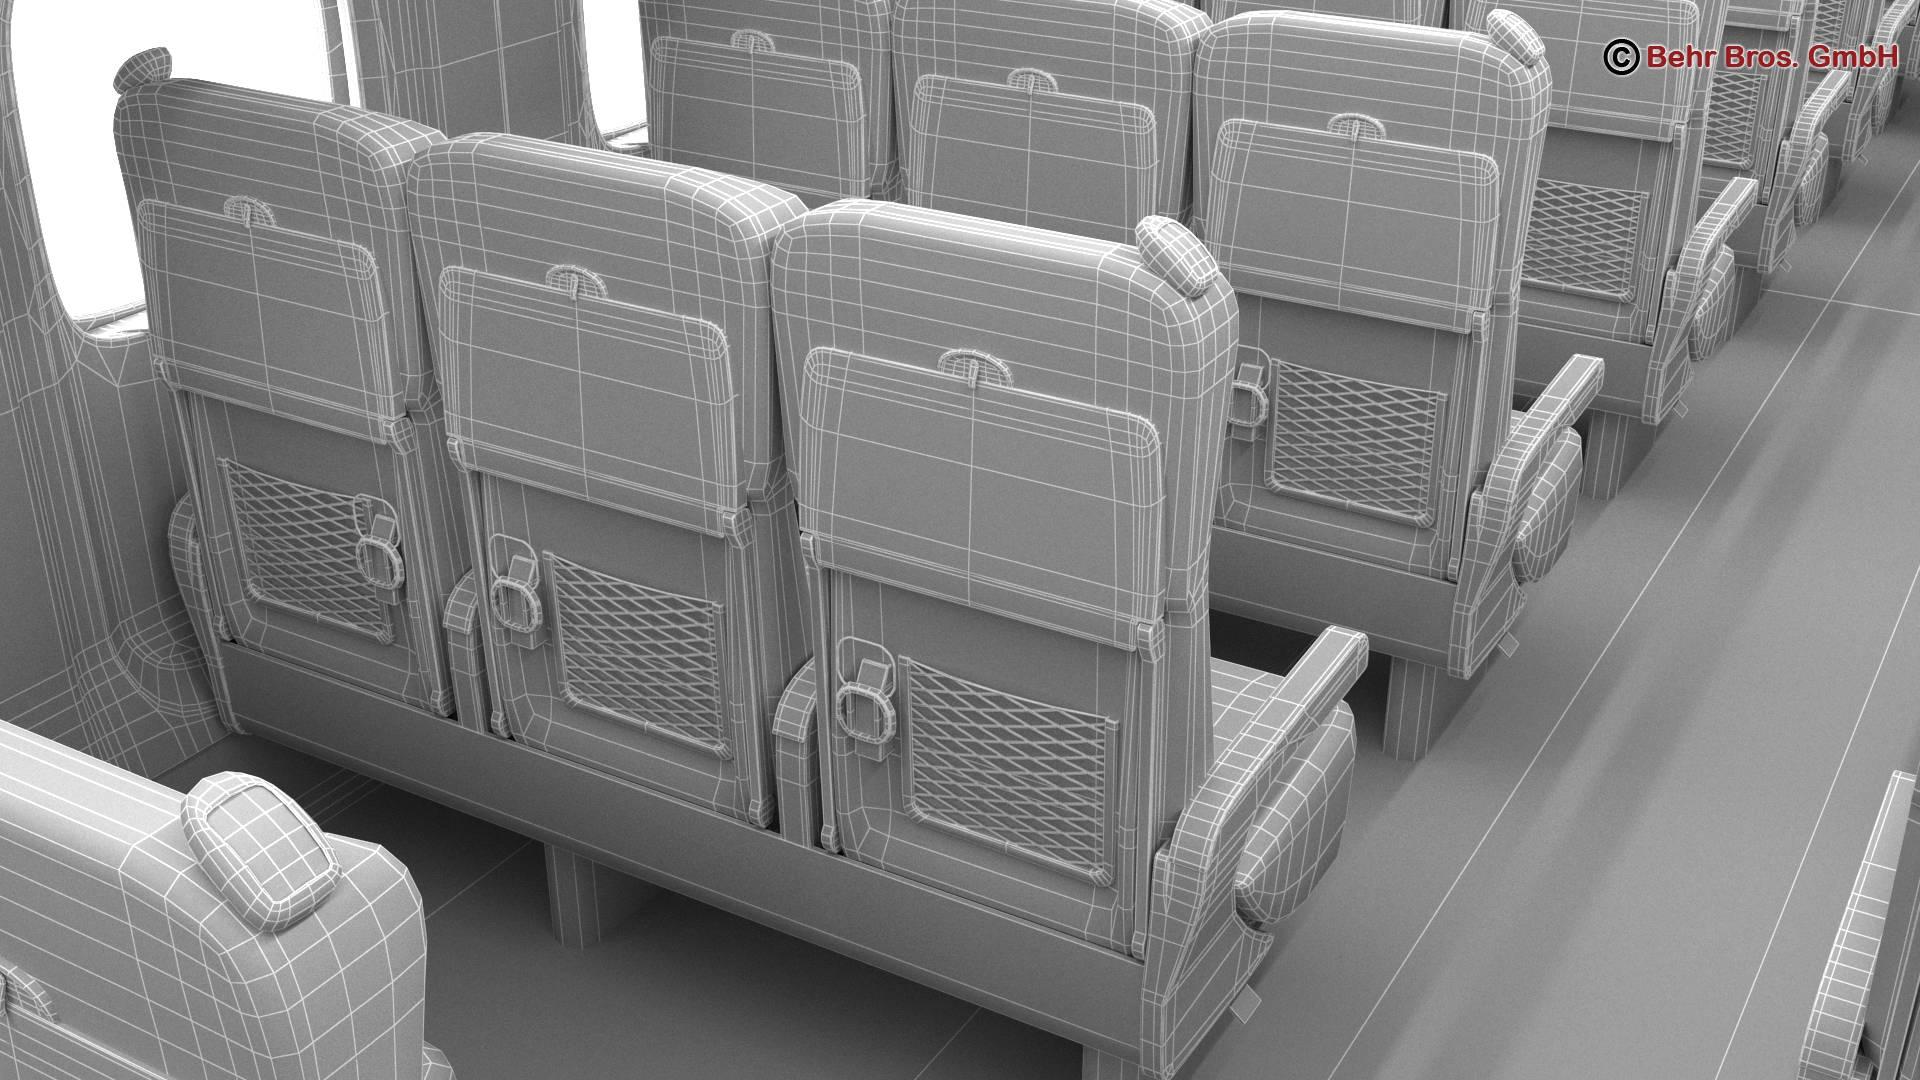 shinkansen e7 3d model 3ds max fbx c4d lwo ma mb obj 265683